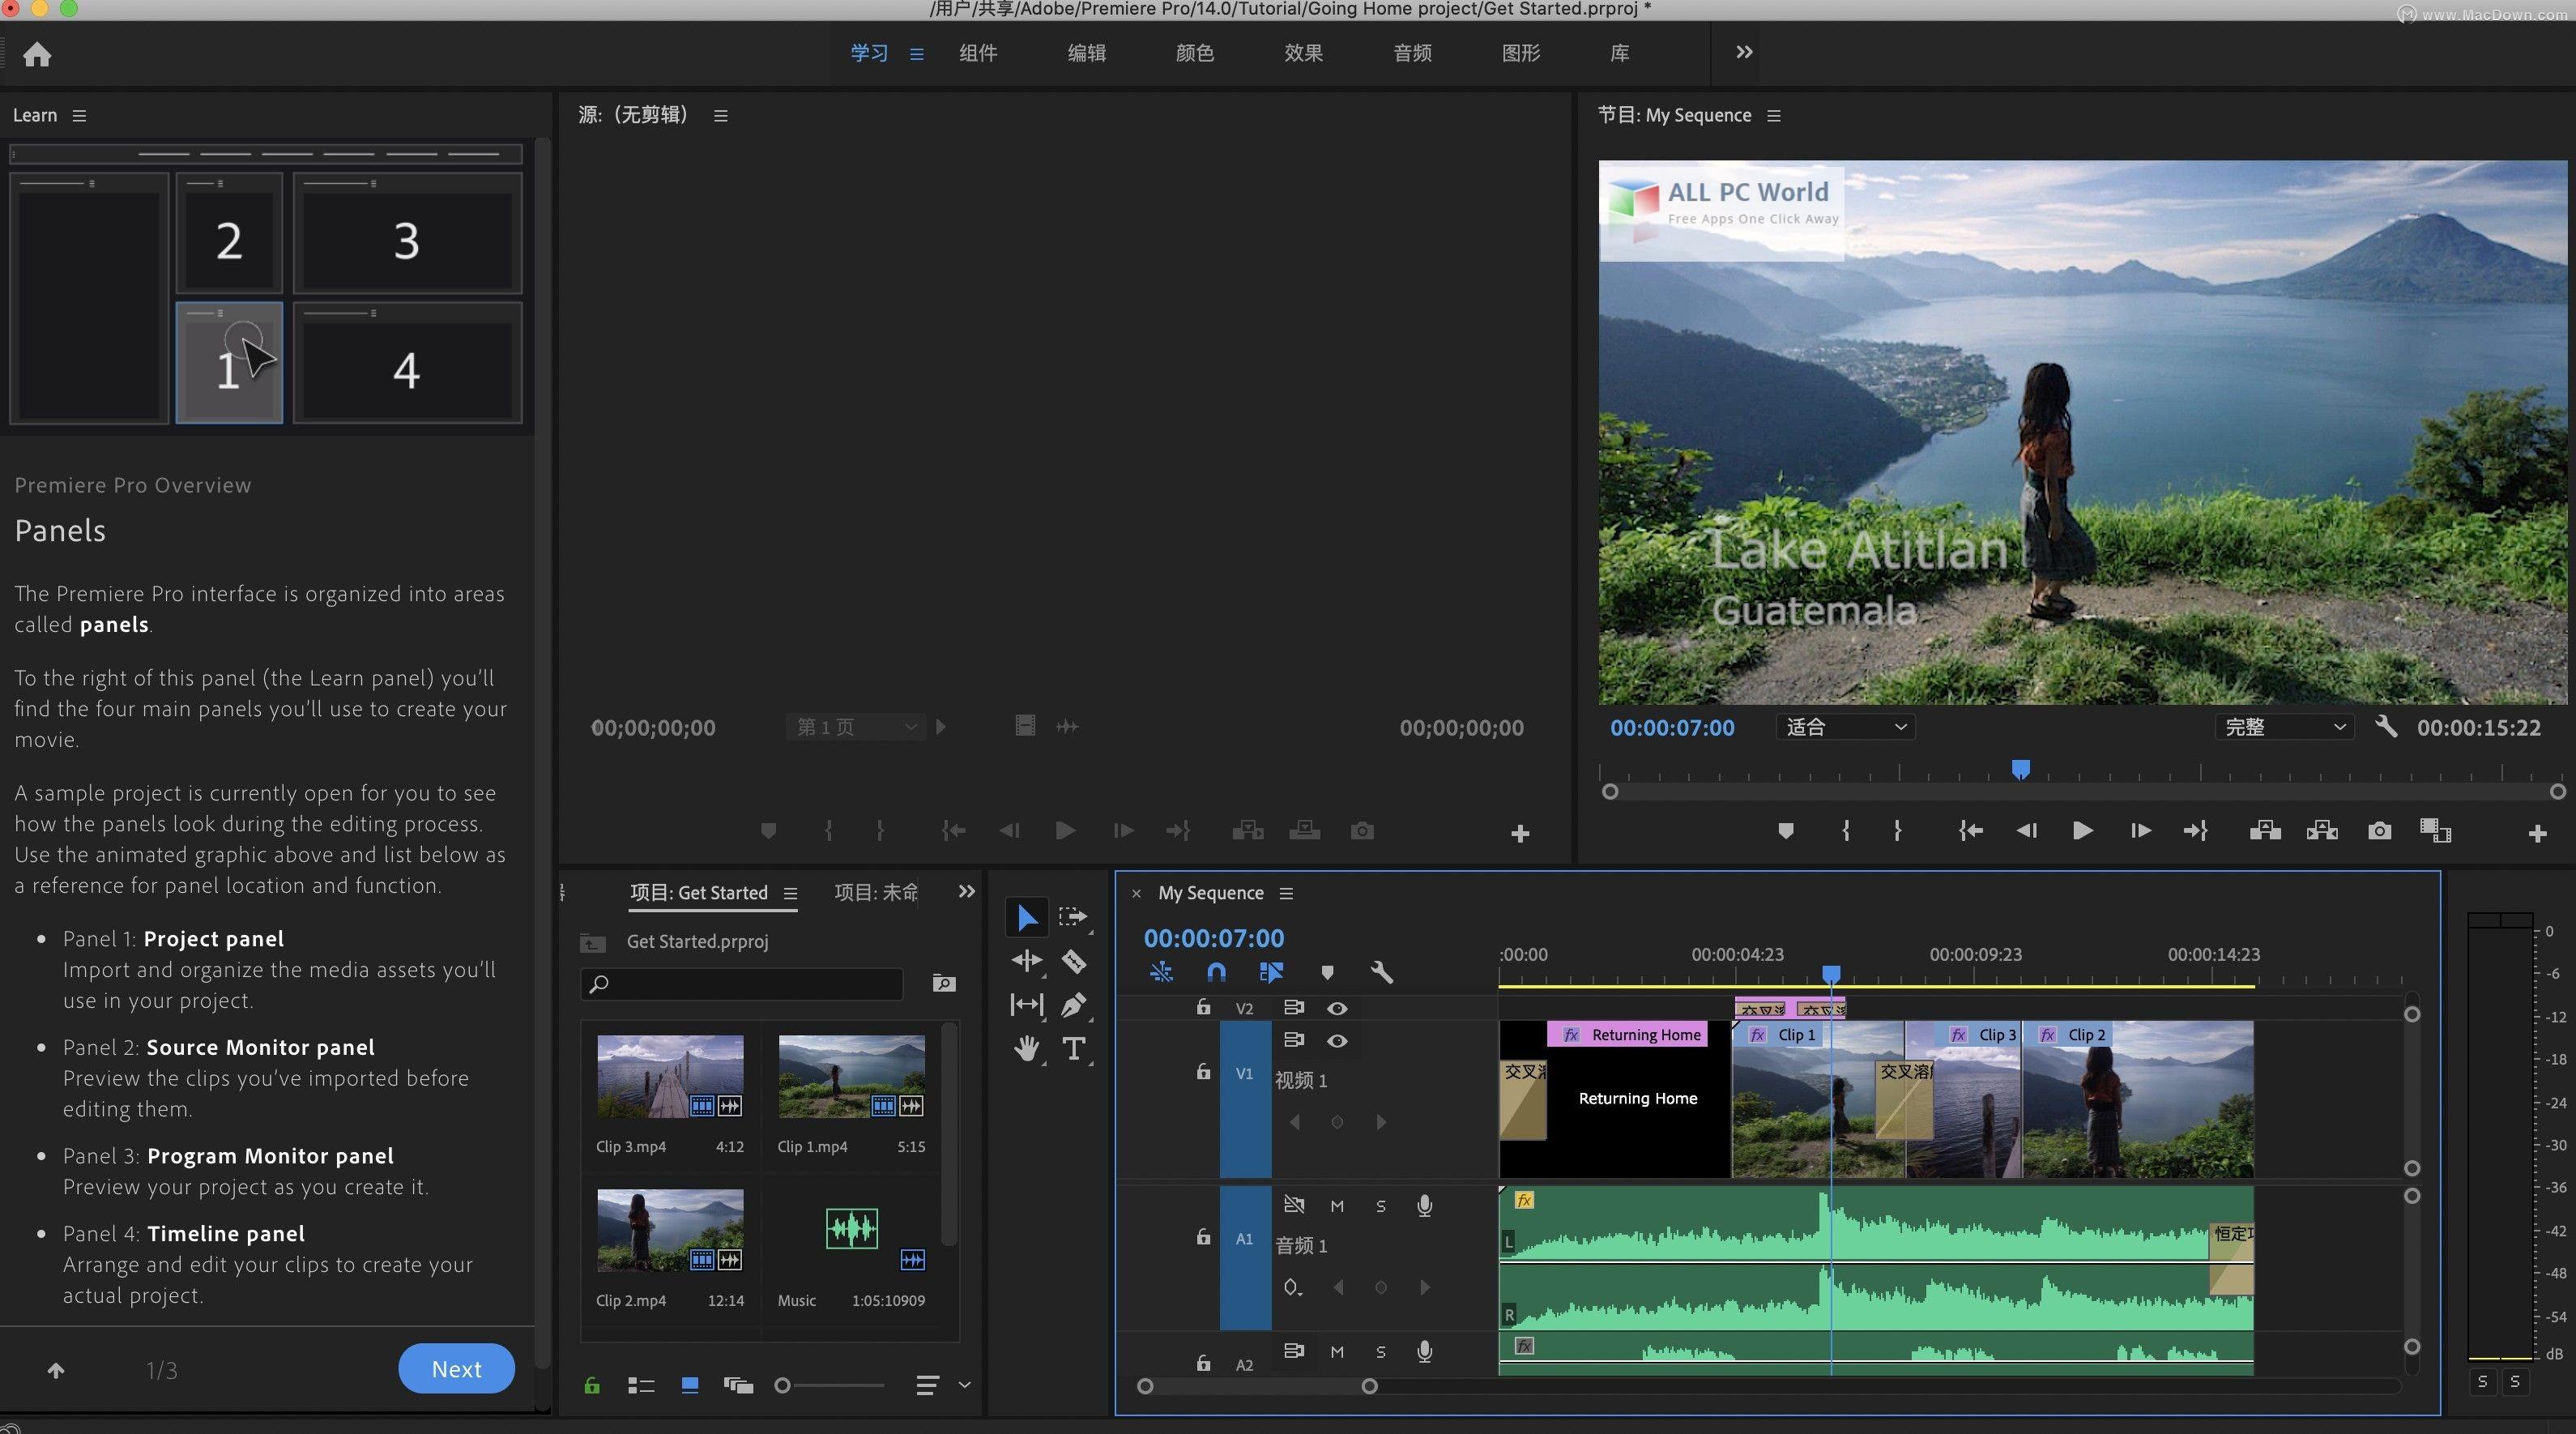 Adobe Premiere Pro CC 2020 v14.0 Free Download